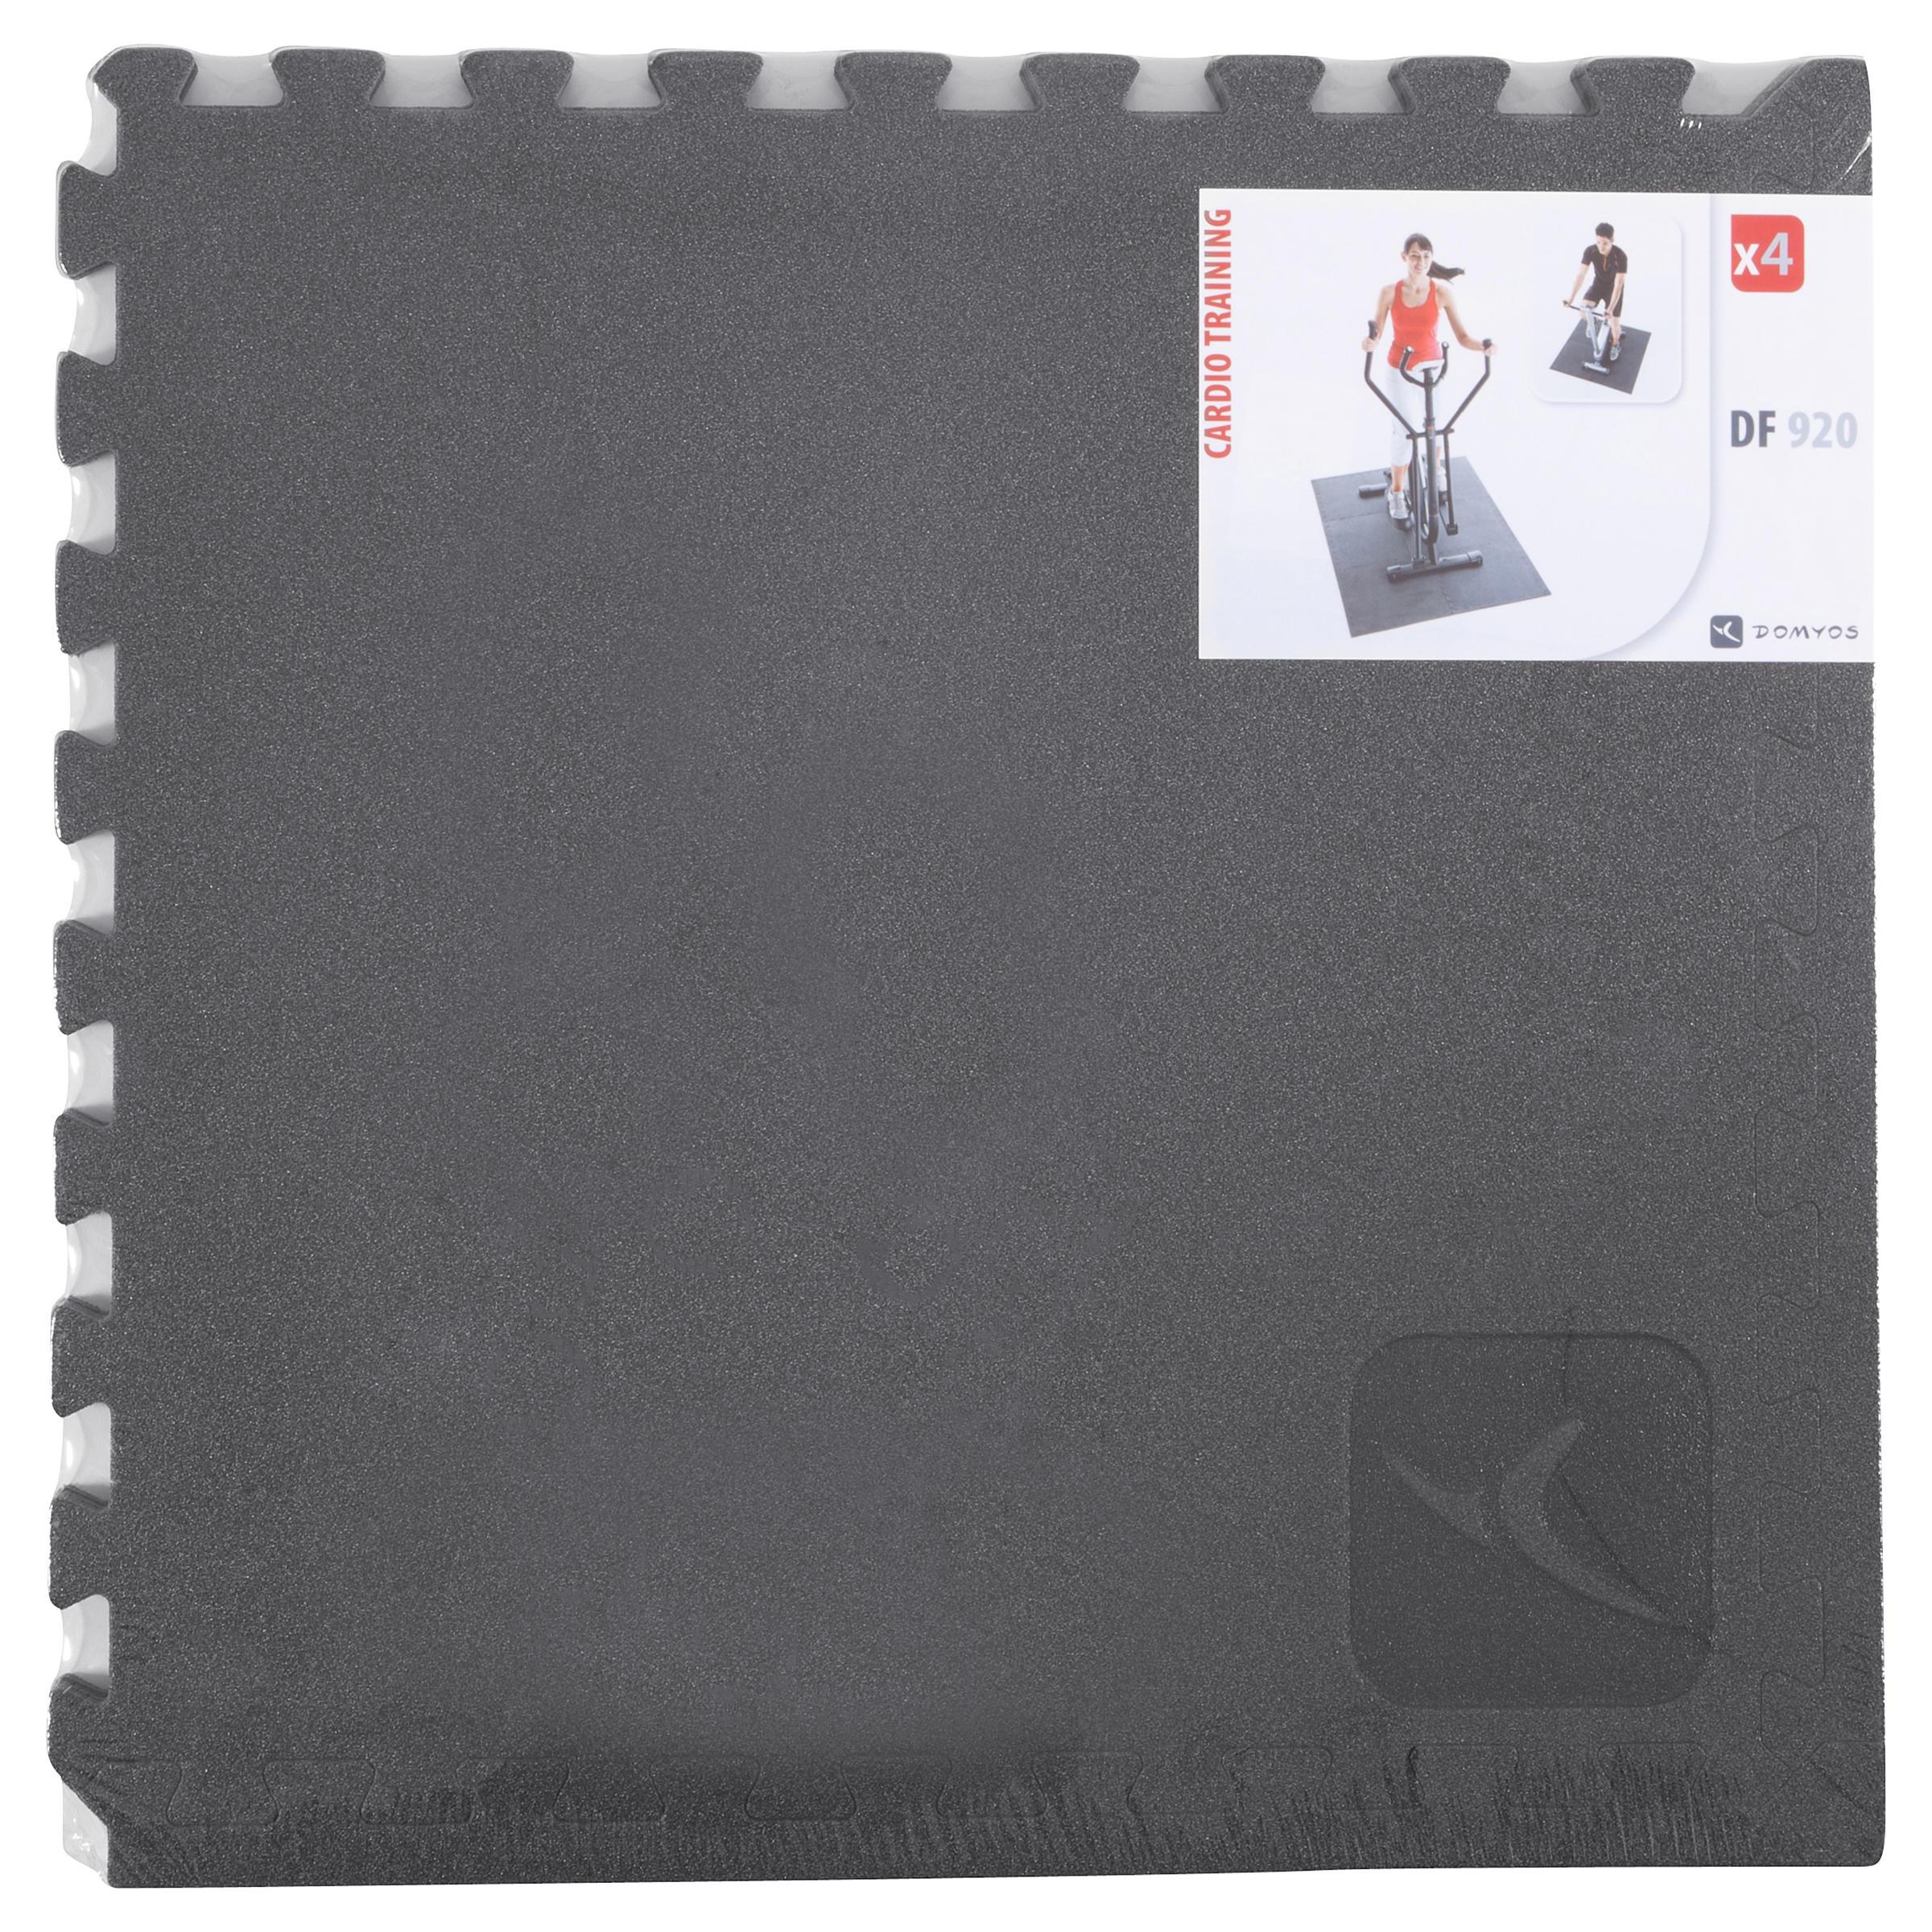 Tapetes suelo DF920 (paquete de 4)